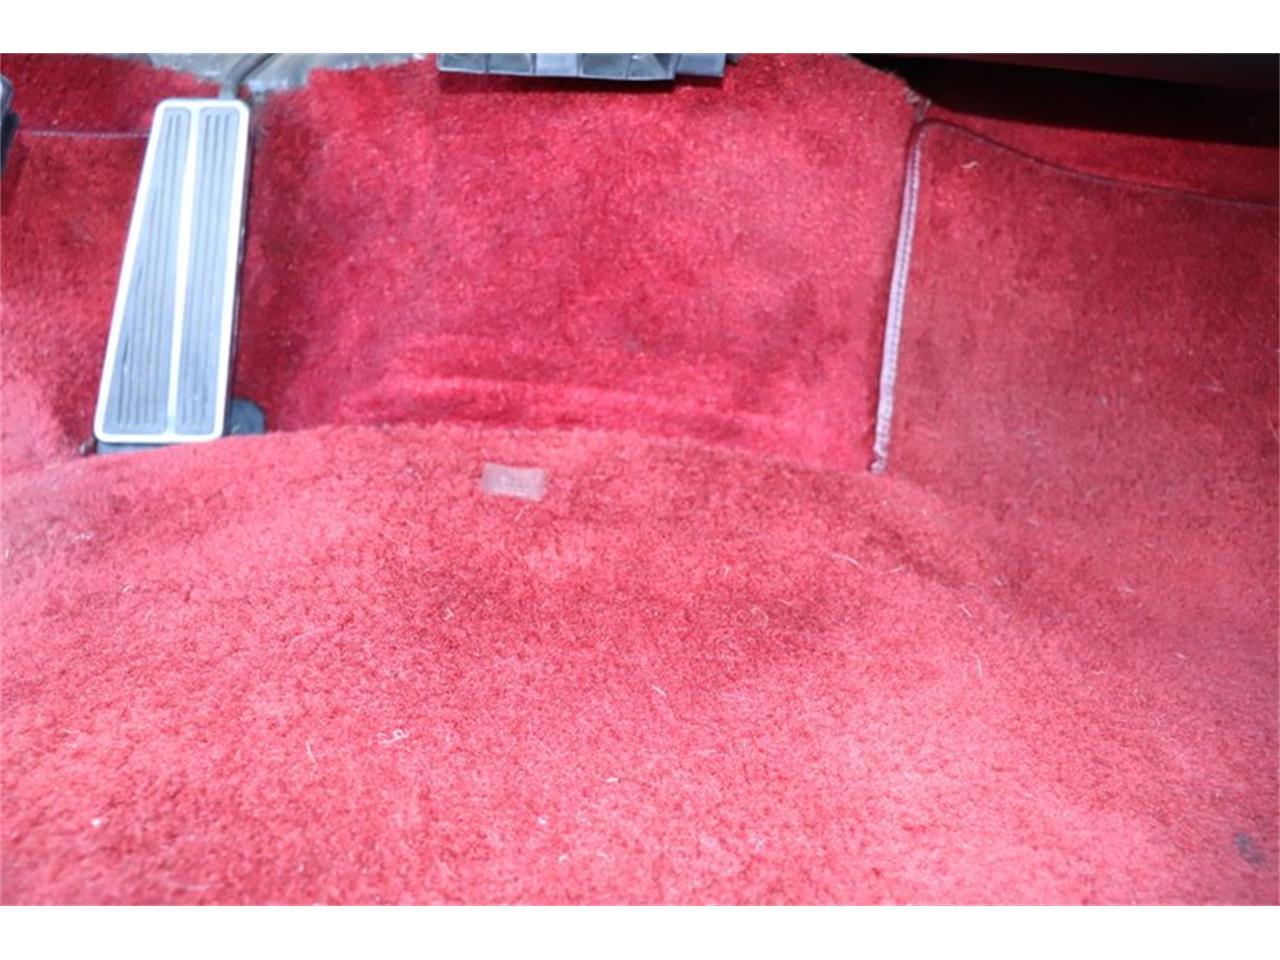 Large Picture of '82 Oldsmobile Toronado - $8,900.00 - PPX3